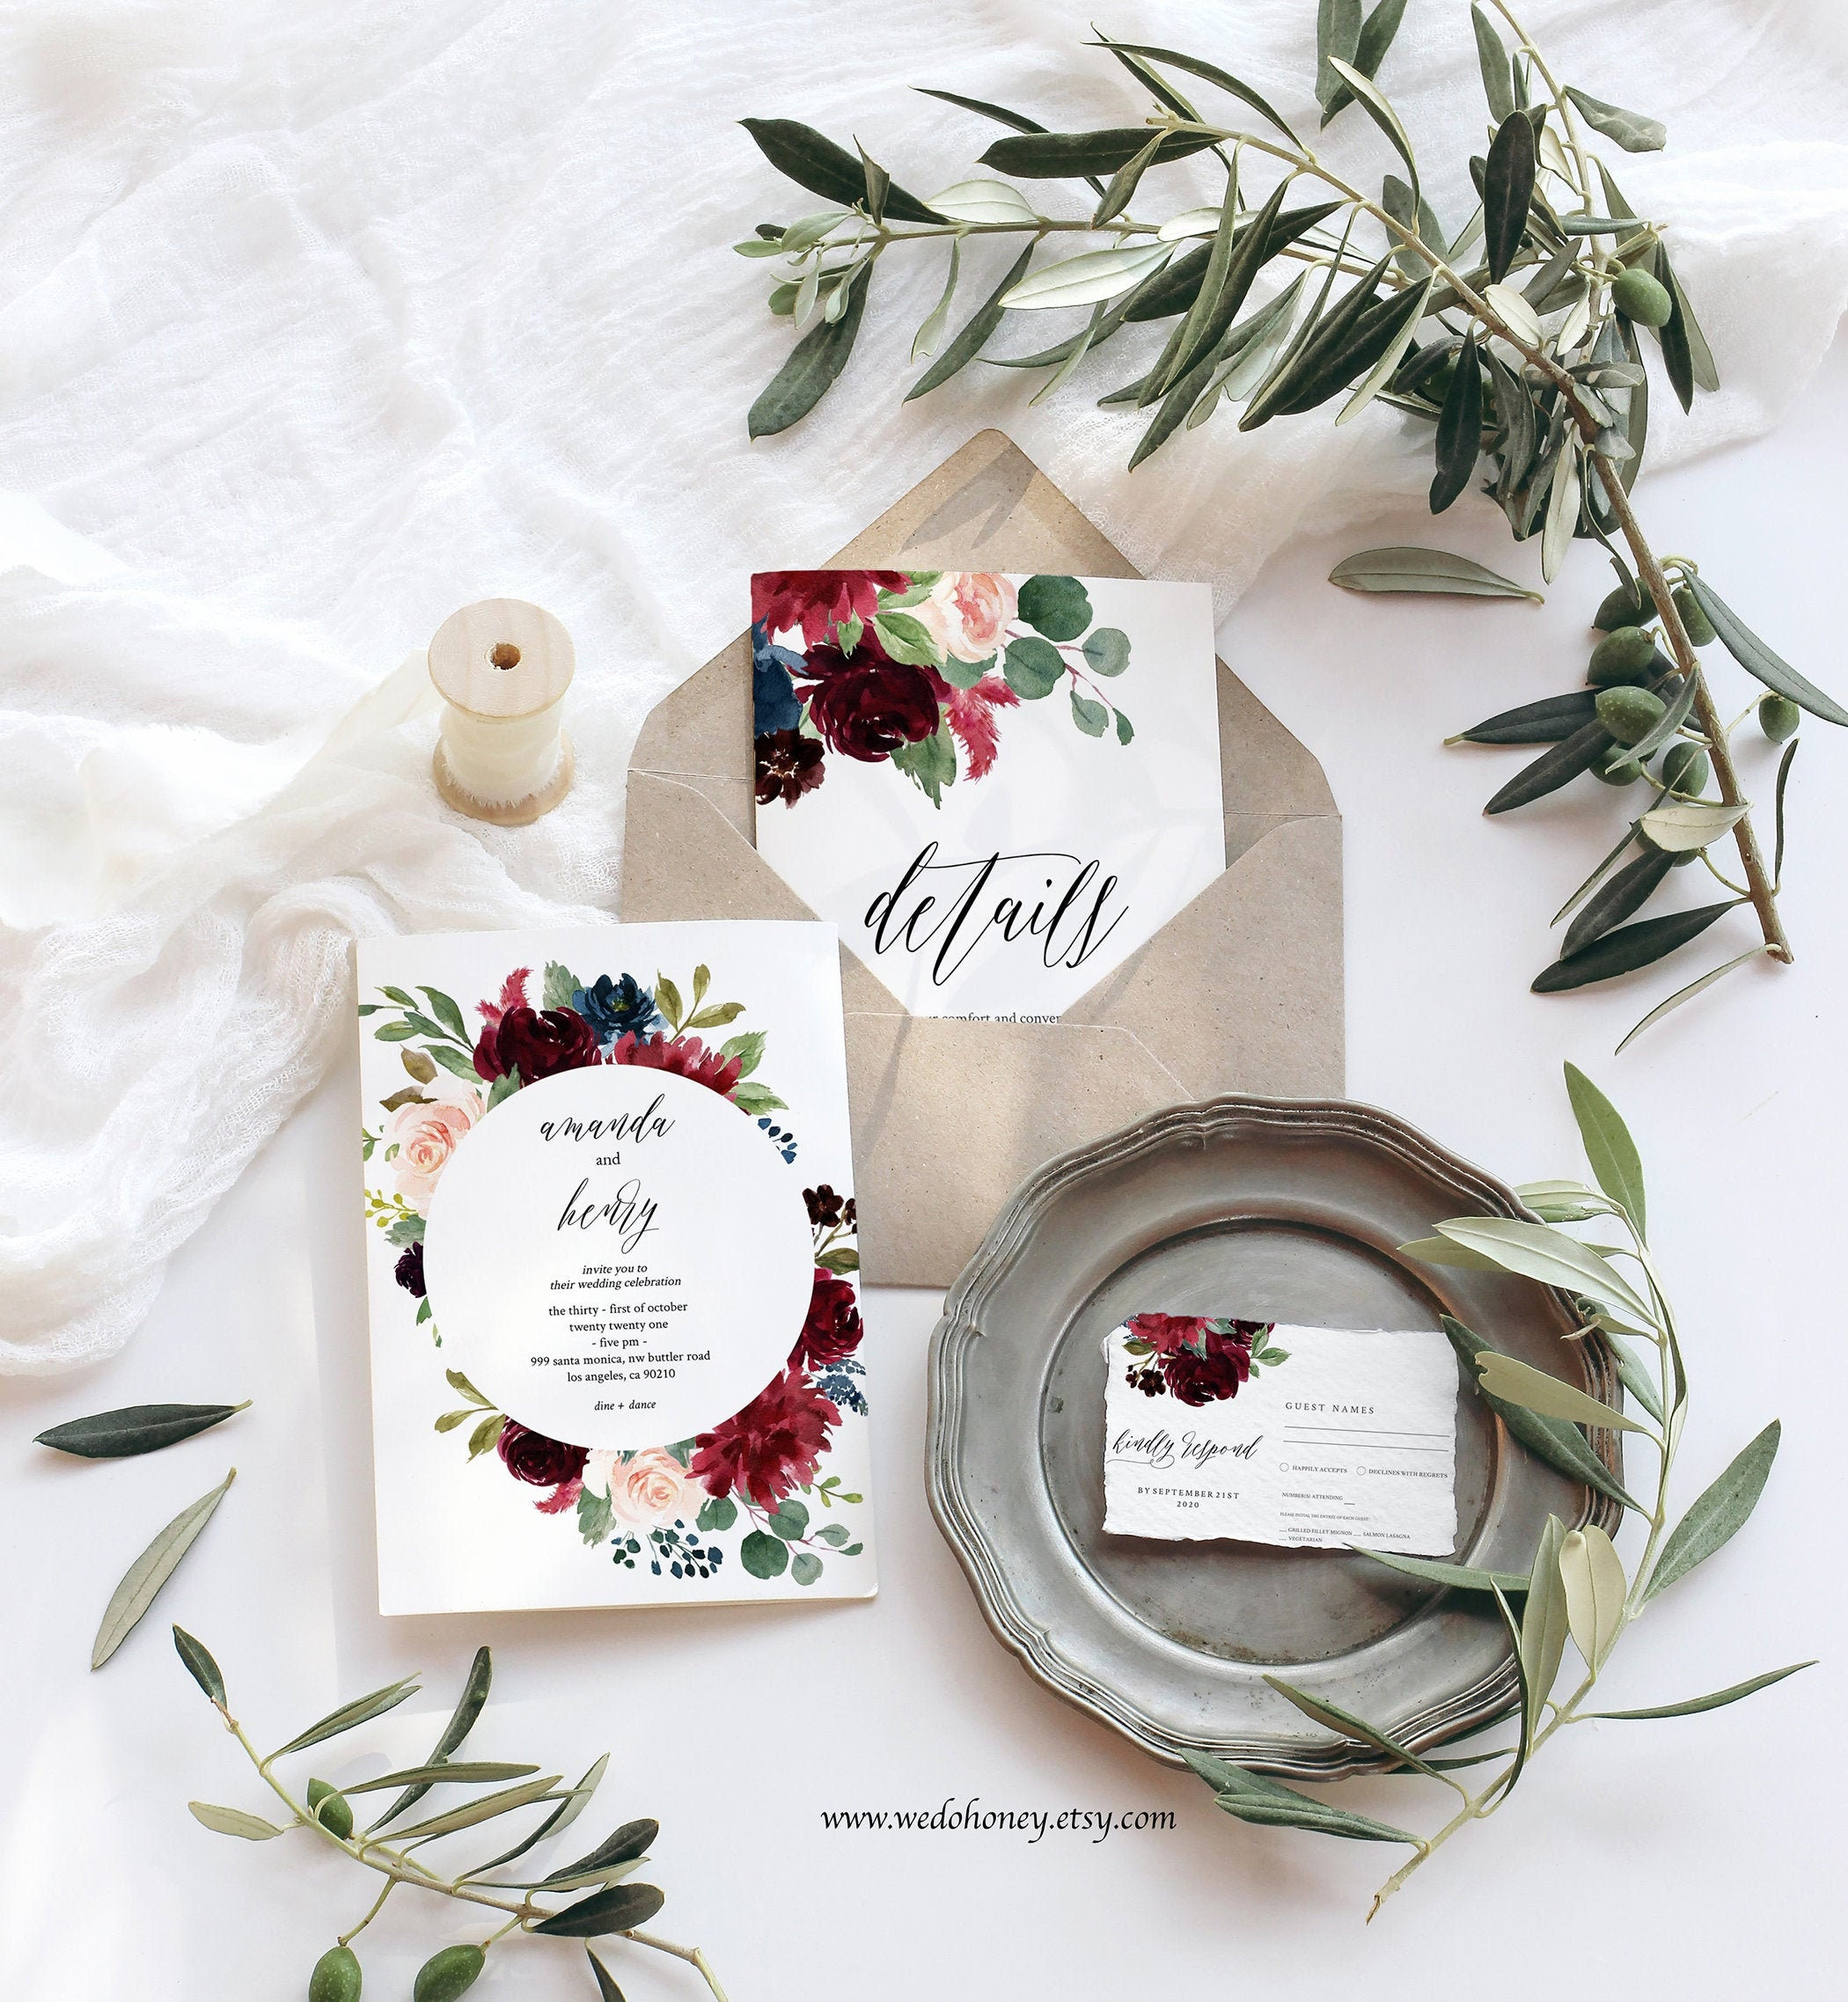 Burgundy Wedding Suite Invitation Template, Boho Florals Merlot, Editable Text #091_1